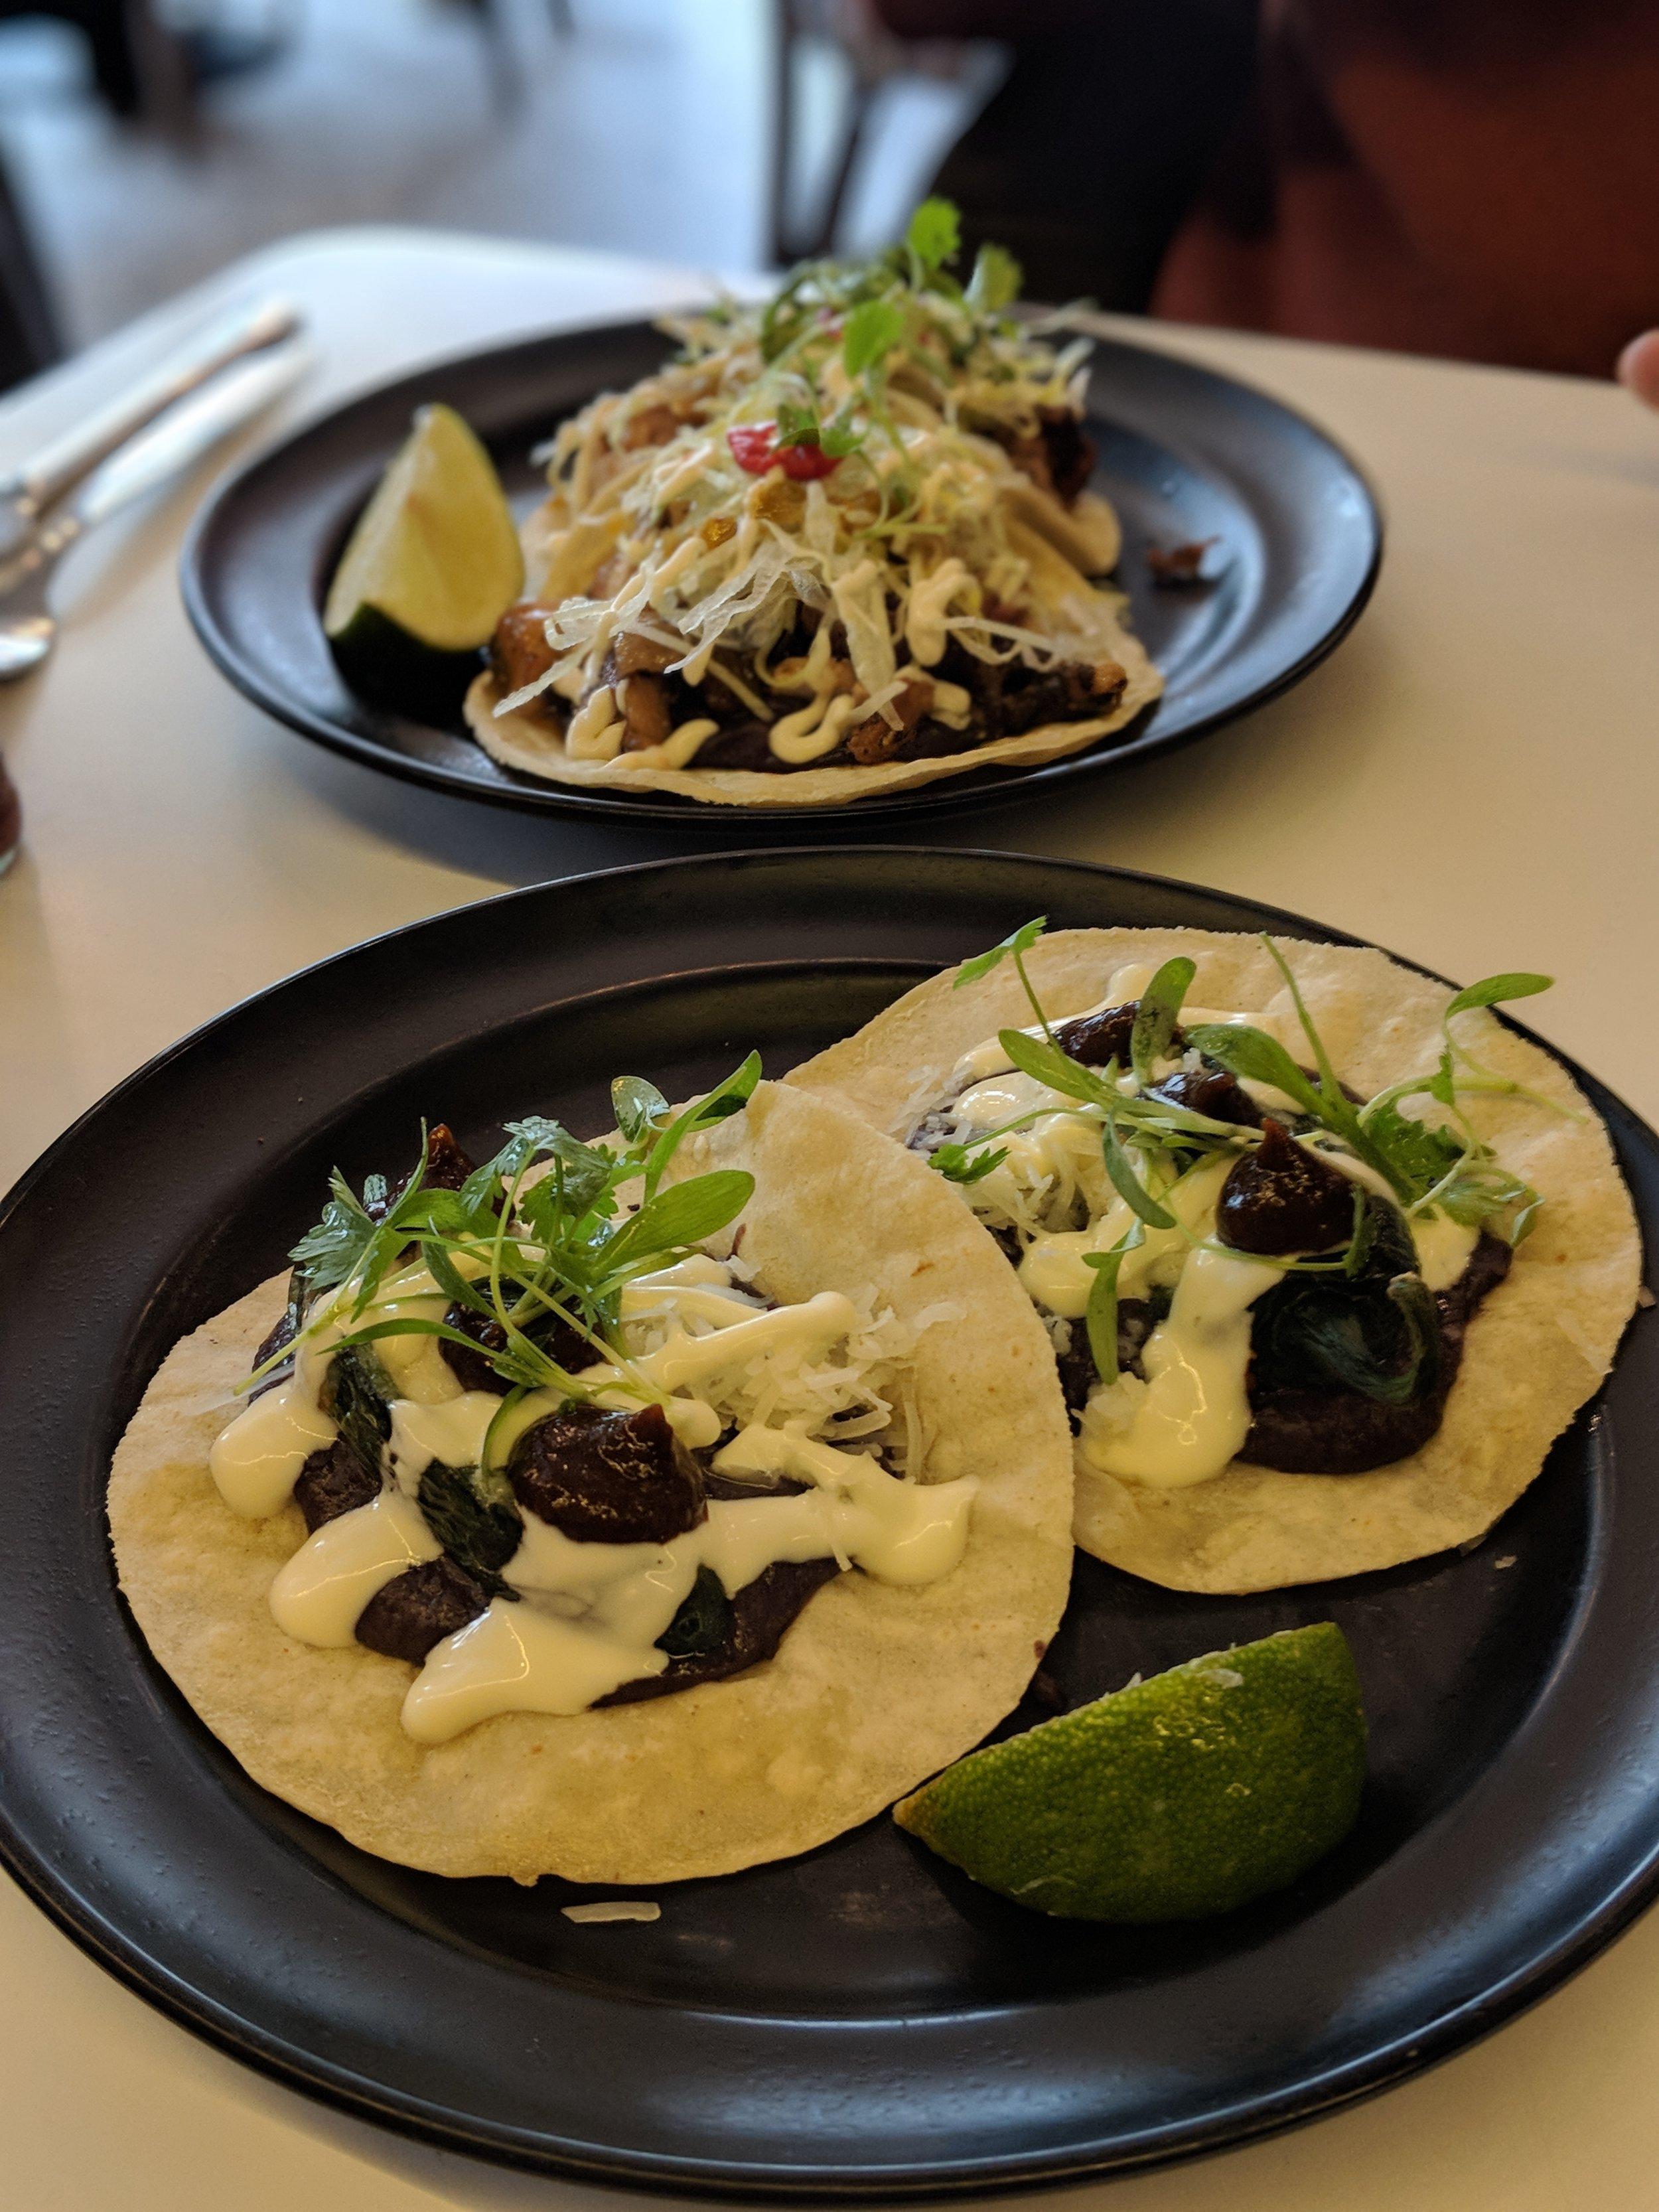 Veggie jalapeño tacos from Tacqueria